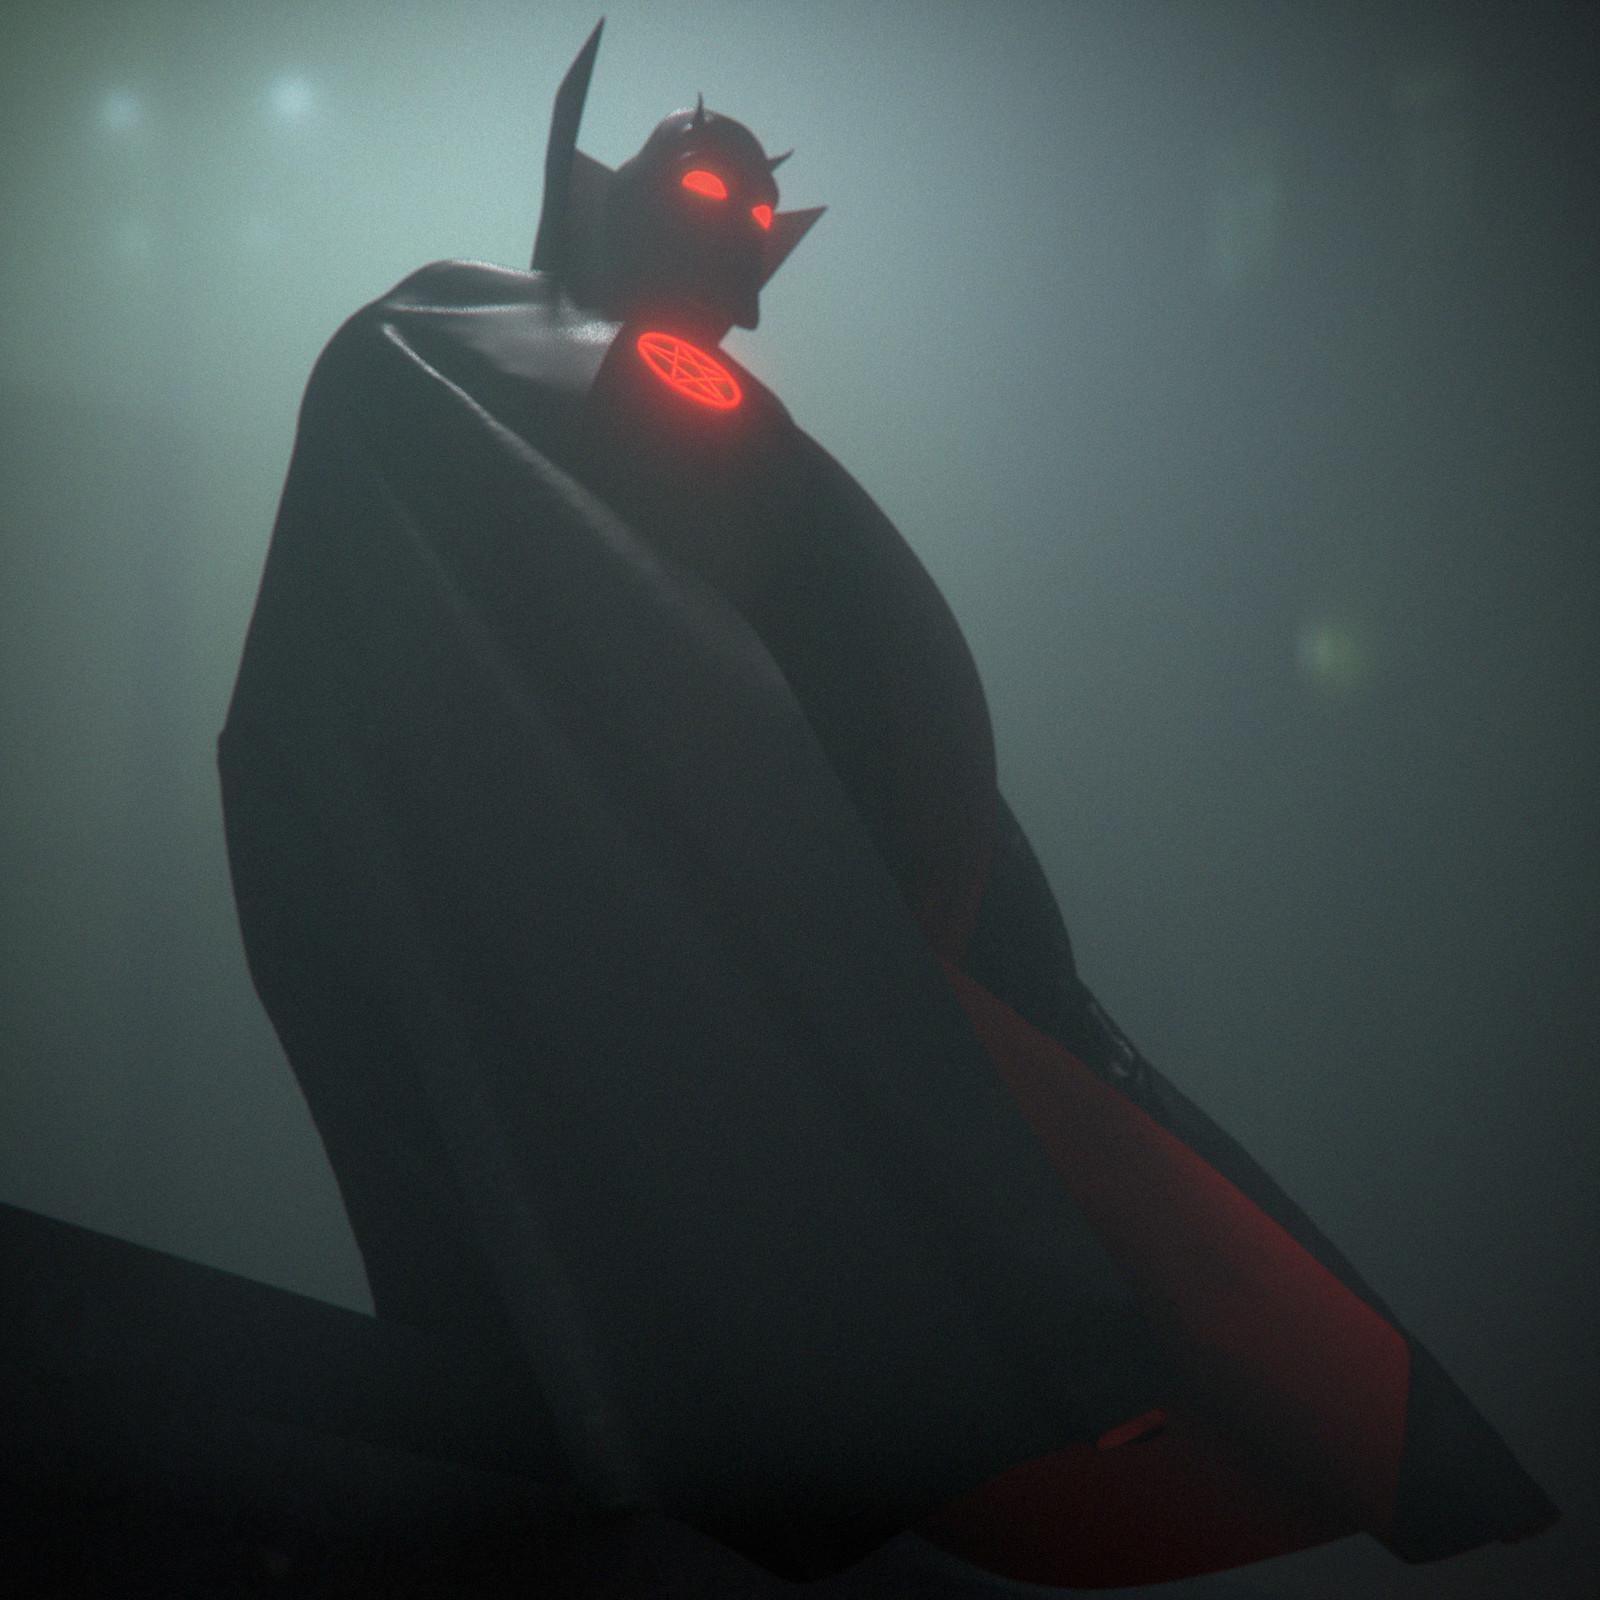 Superhero Solo #14